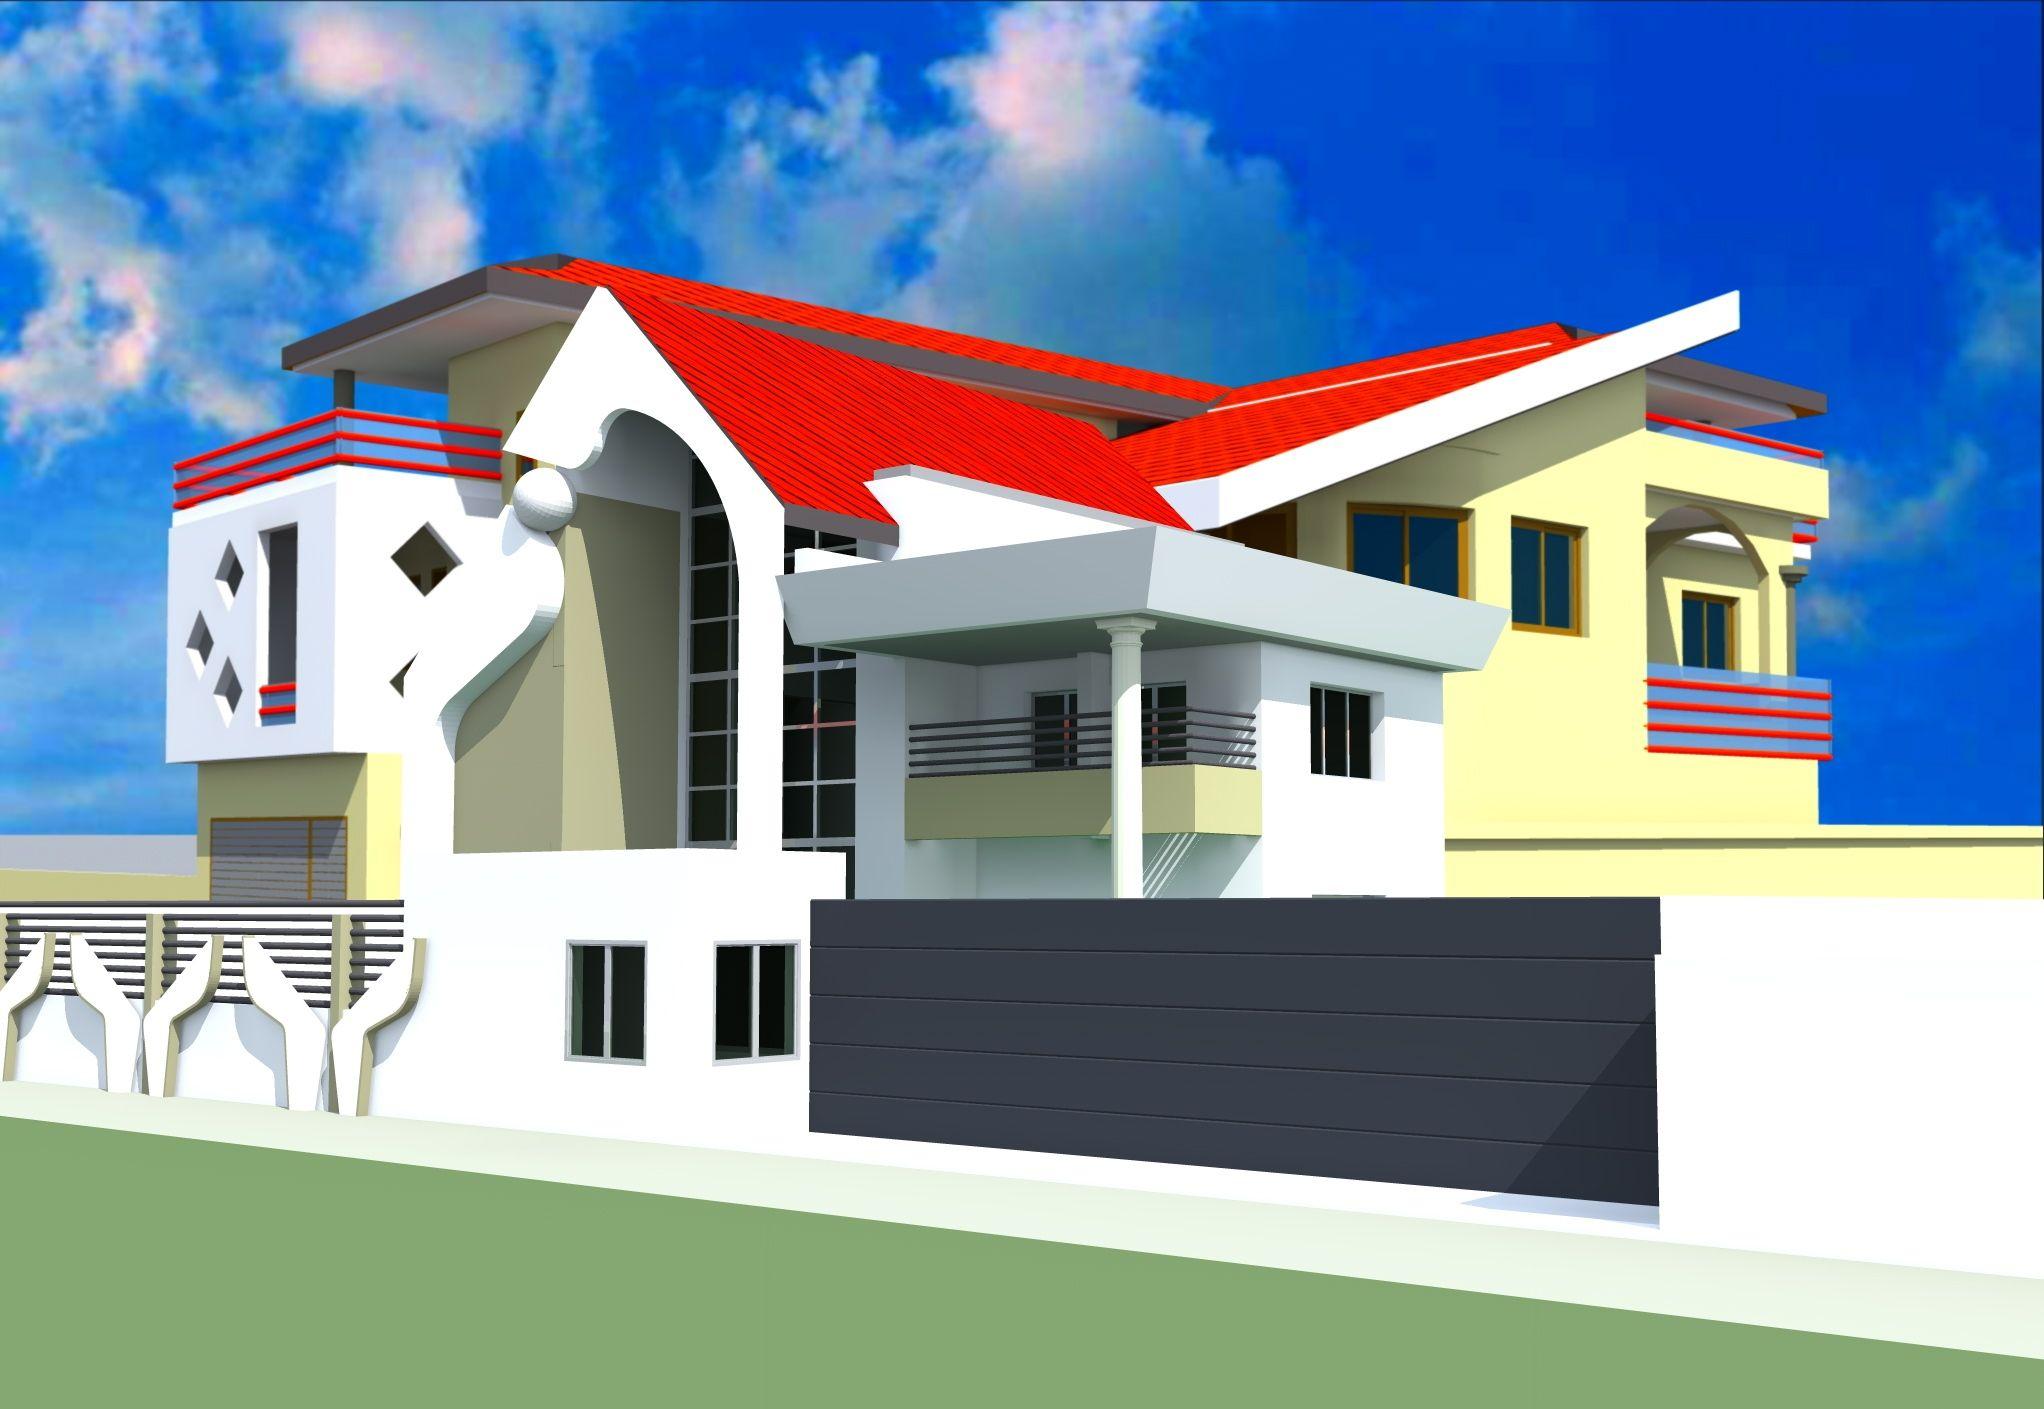 F star house design tanzania 2014 for Star home designs